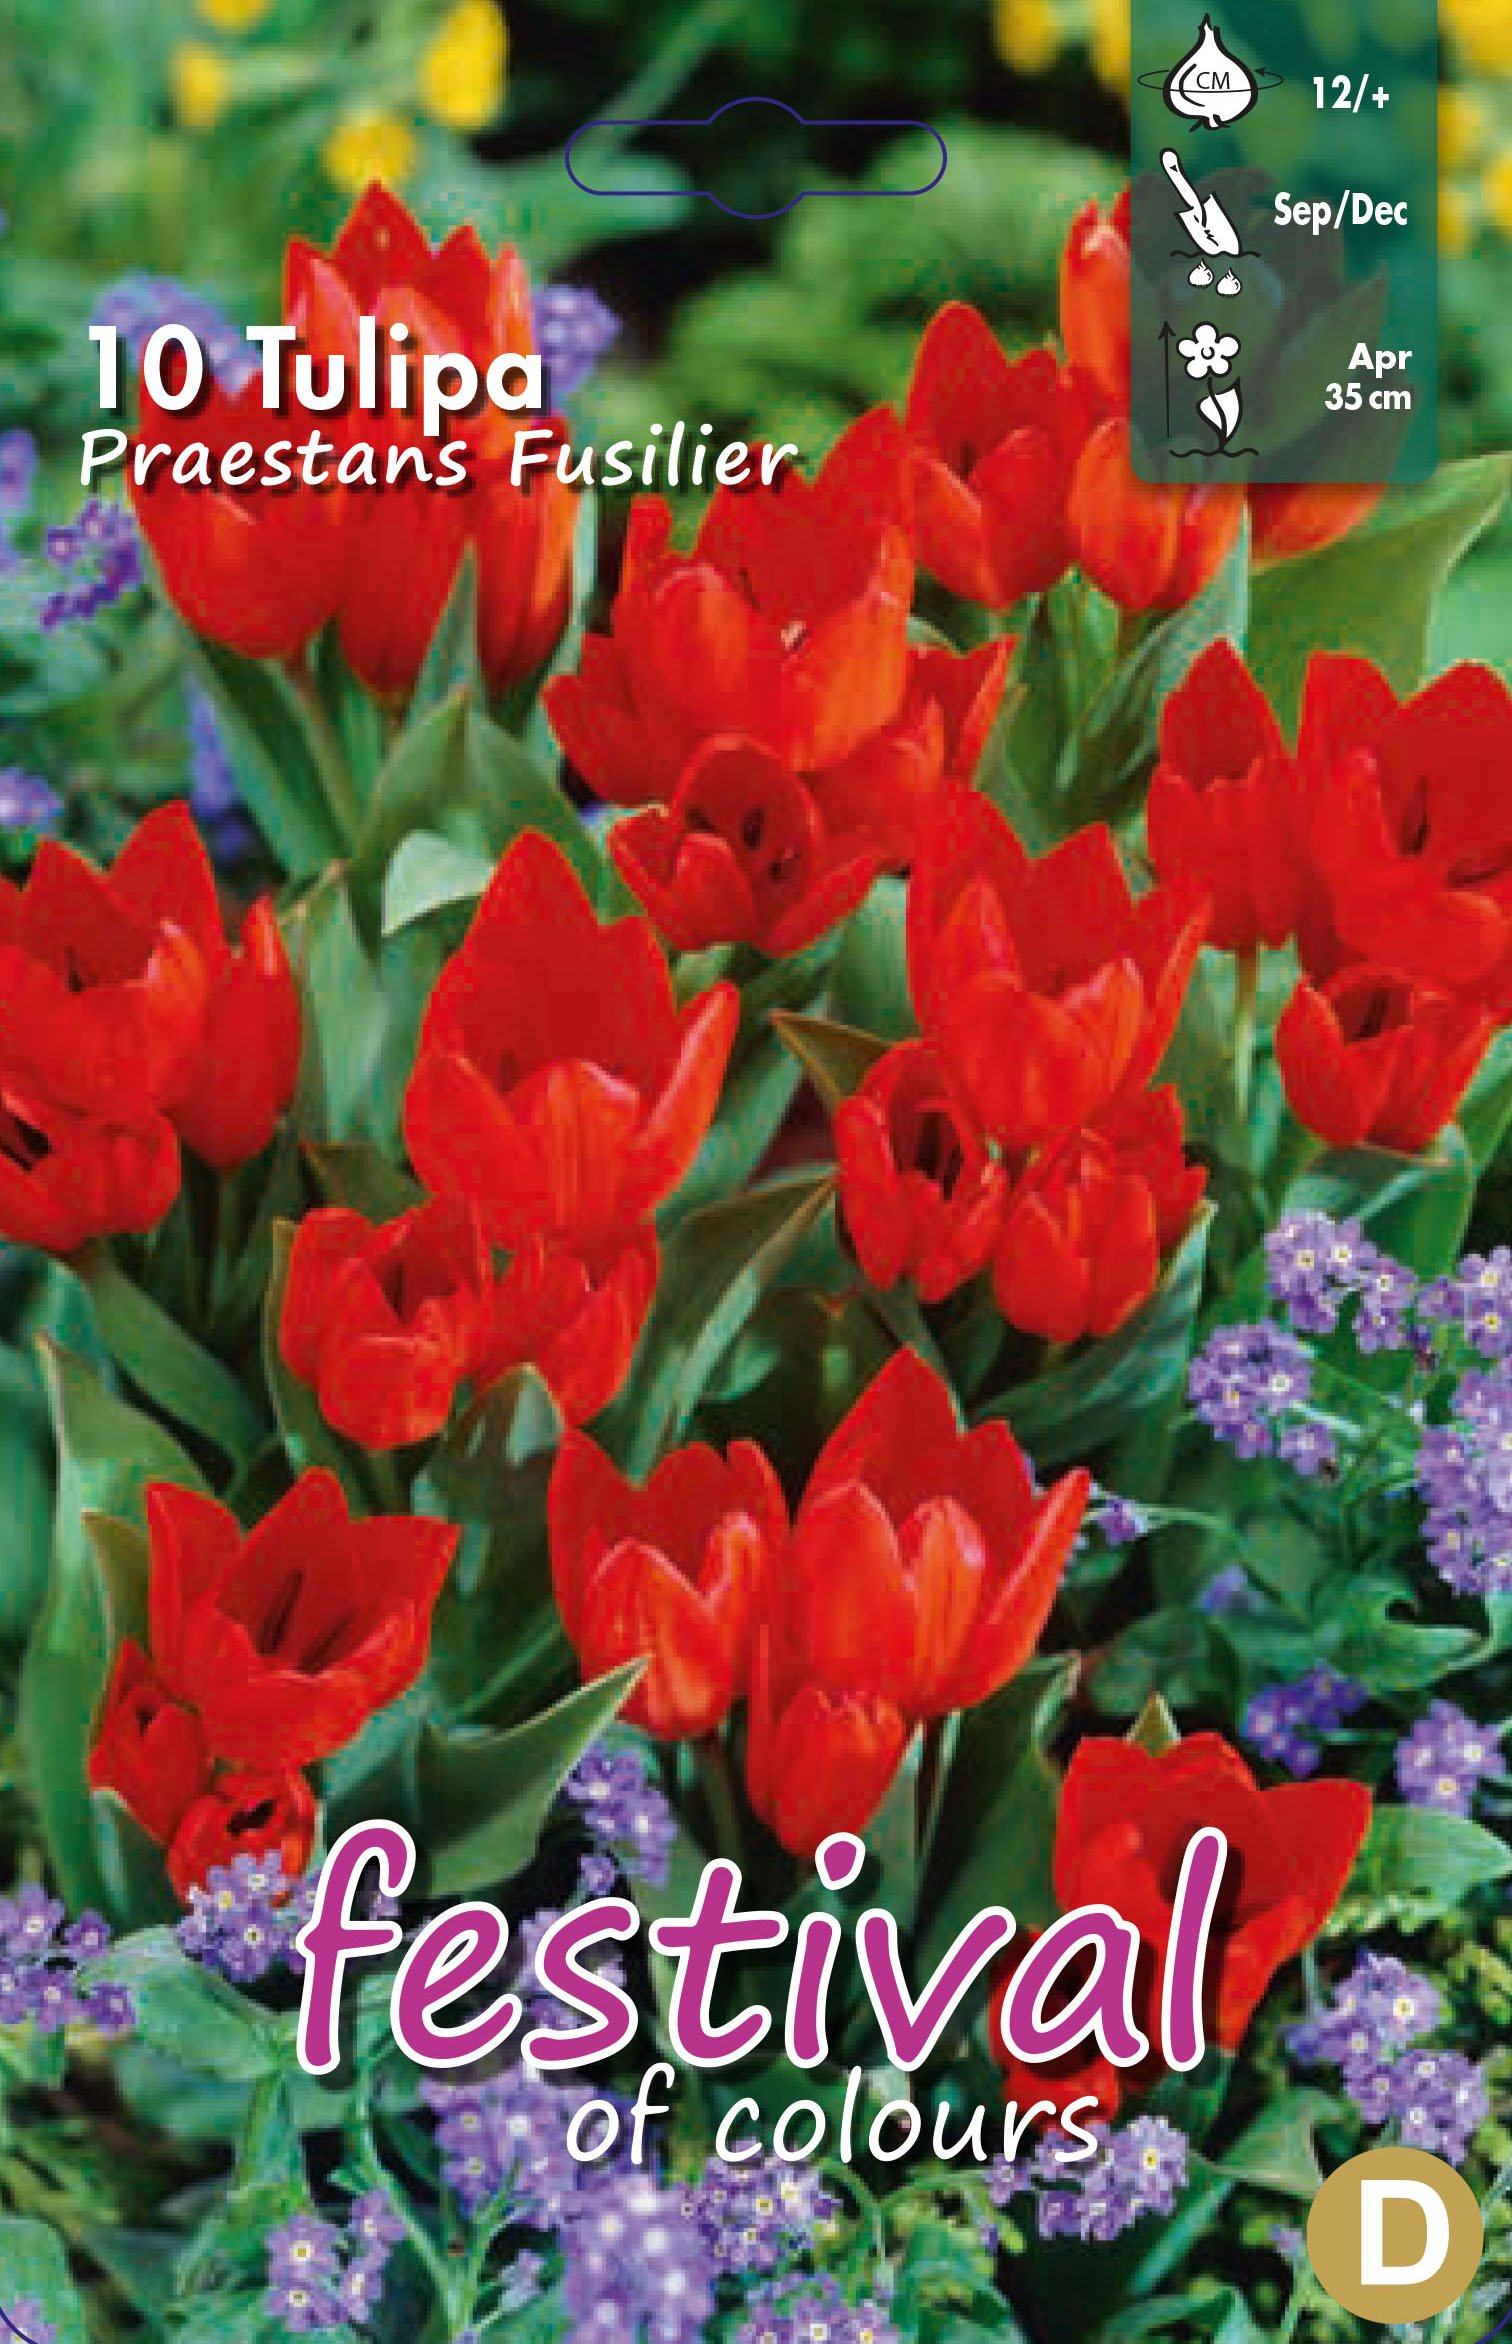 Tulipa Praestans Fusilier 10 stk